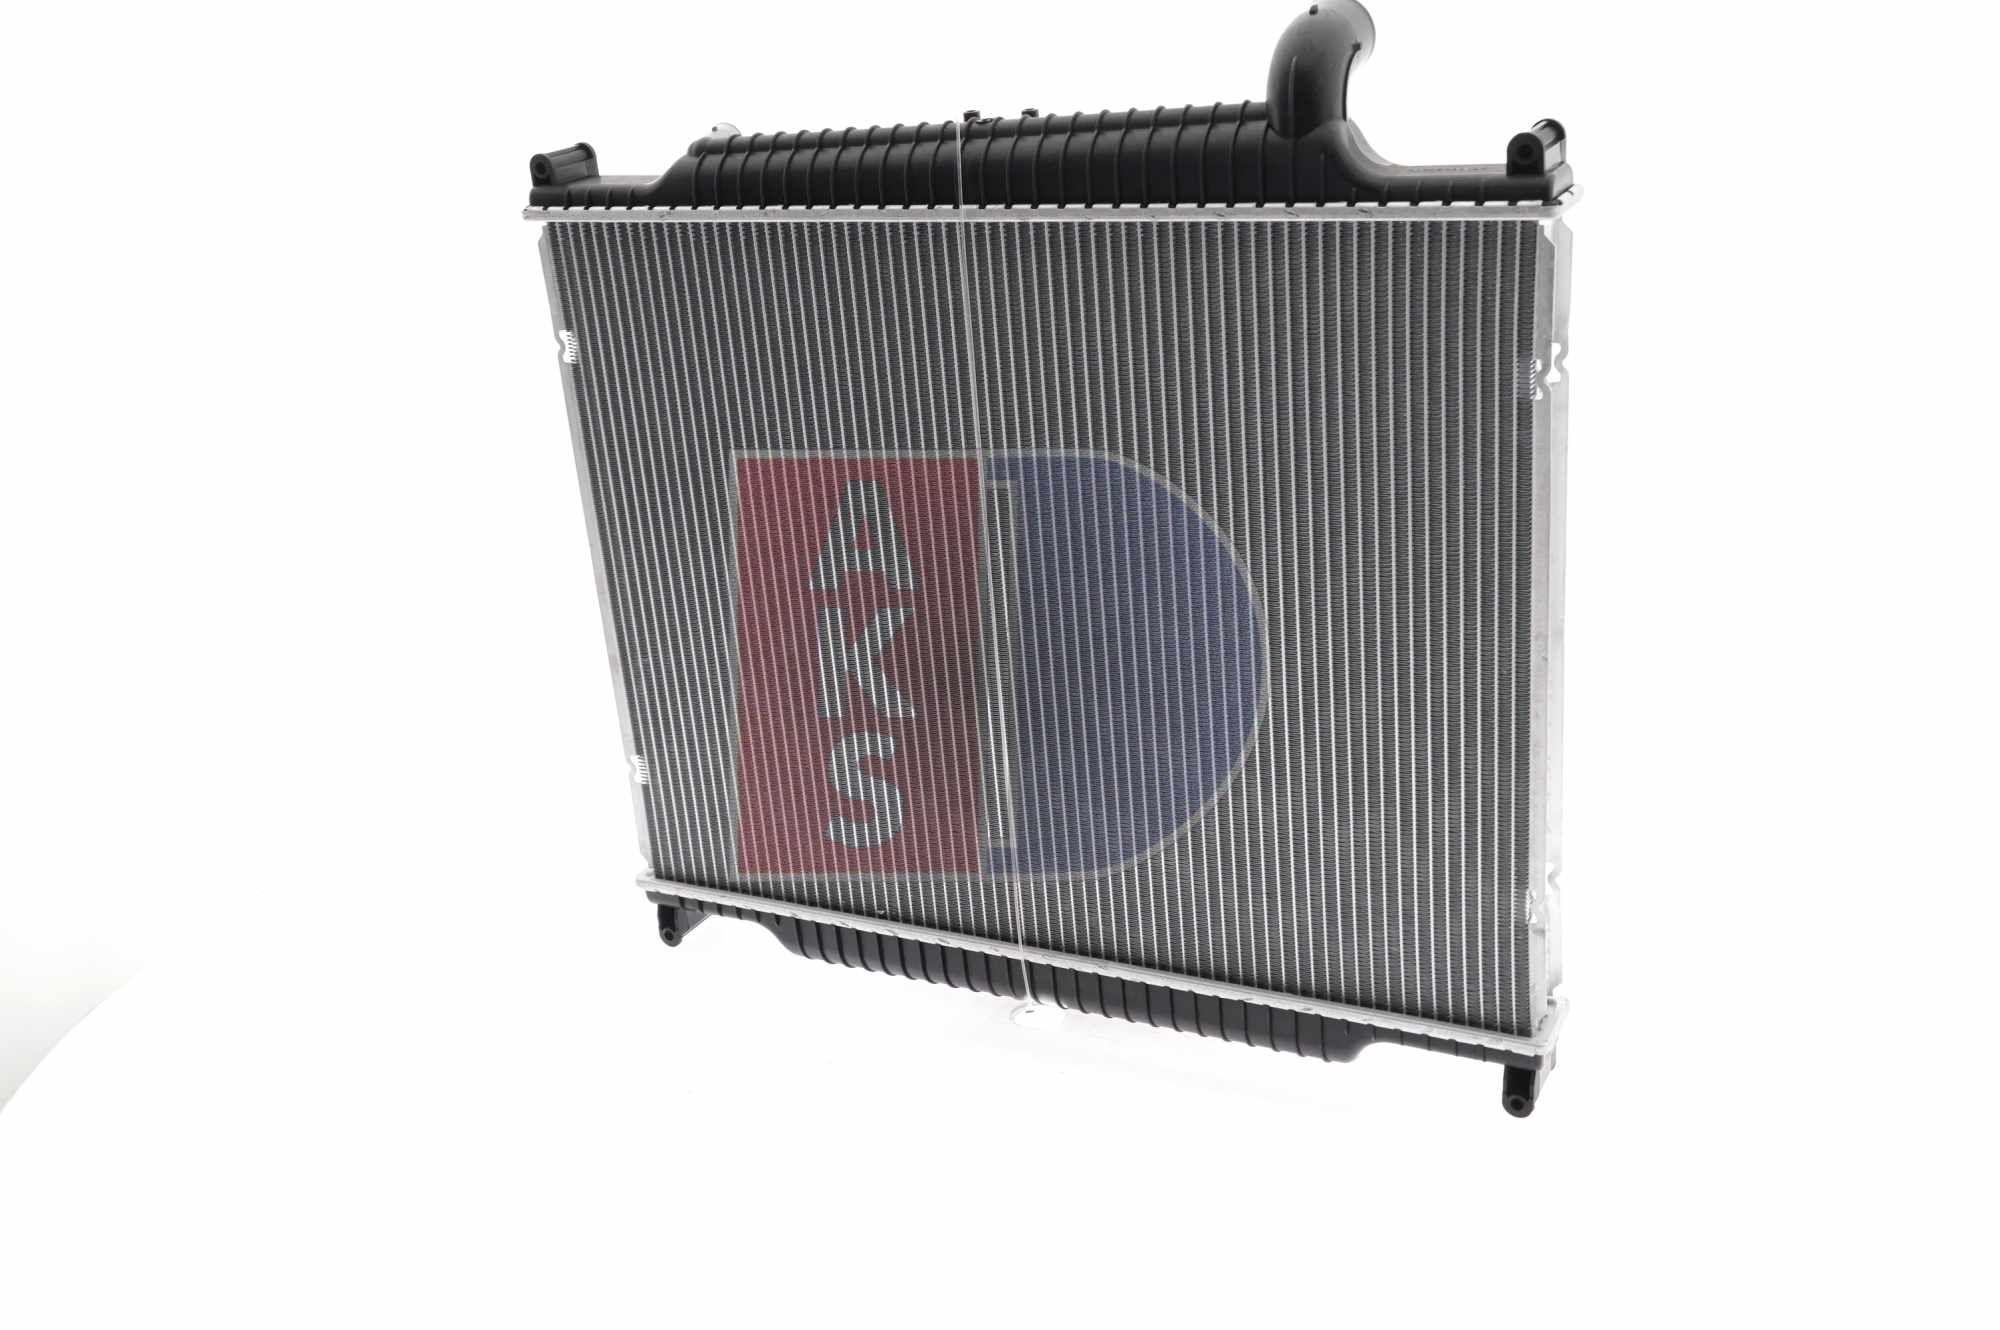 020023N Wasserkühler AKS DASIS 020023N - Große Auswahl - stark reduziert